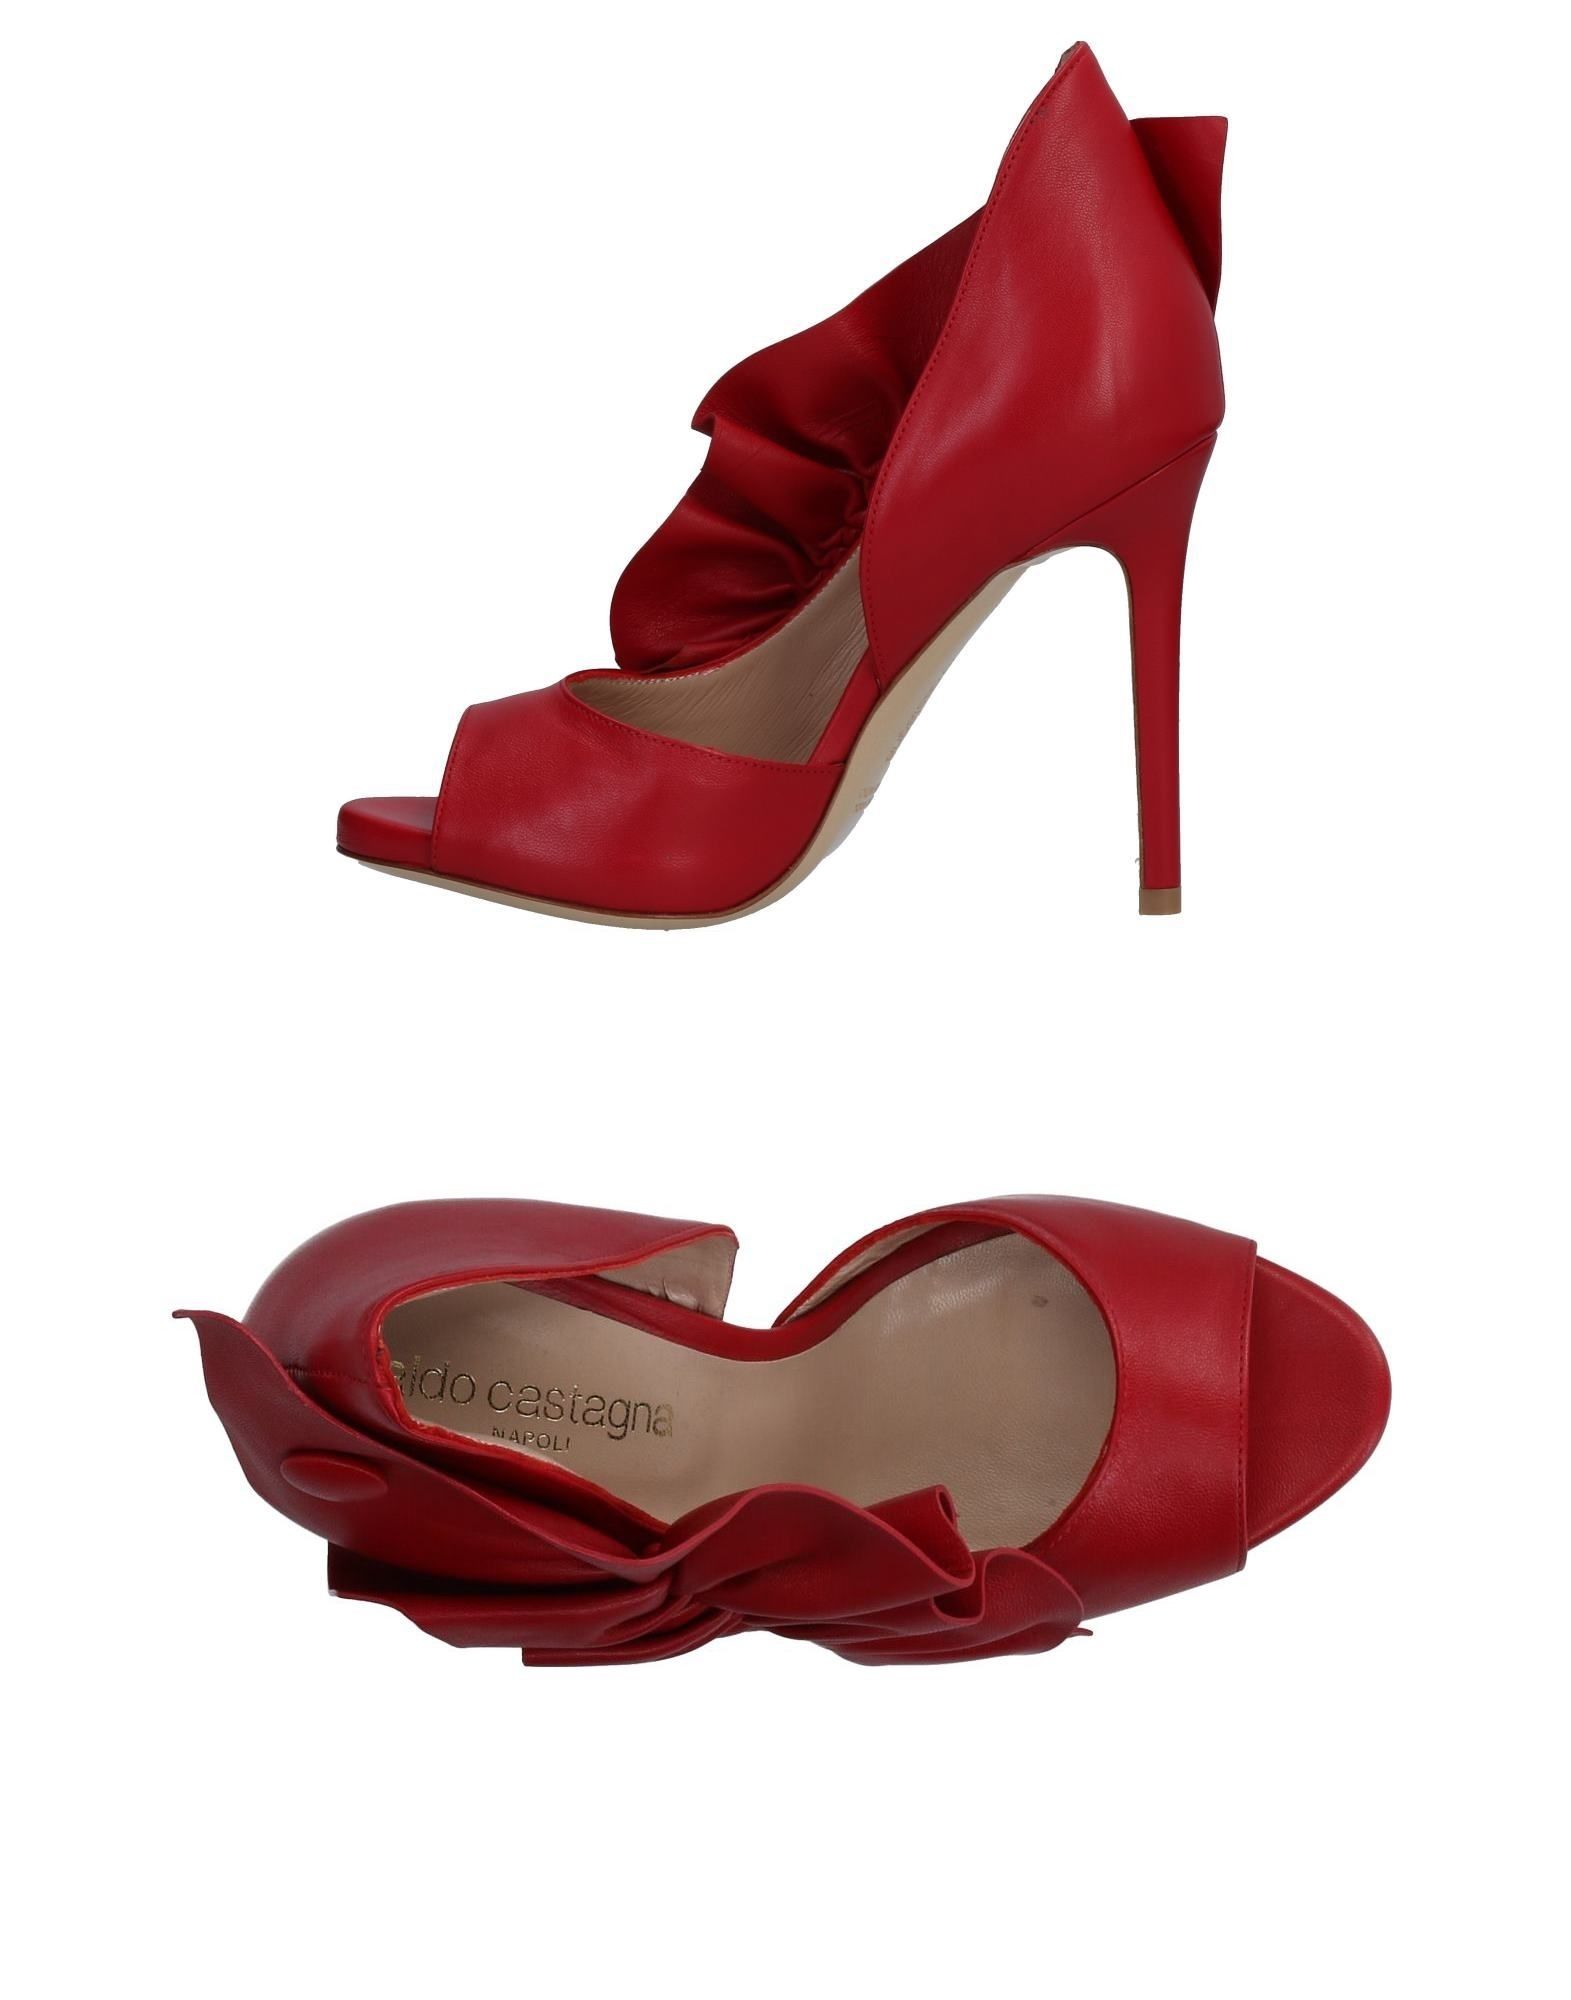 92da8b4ac ALDO WT625D2D3 CASTAGNA Сандалии 8A8FA8235EA Обувь Сандалии ...